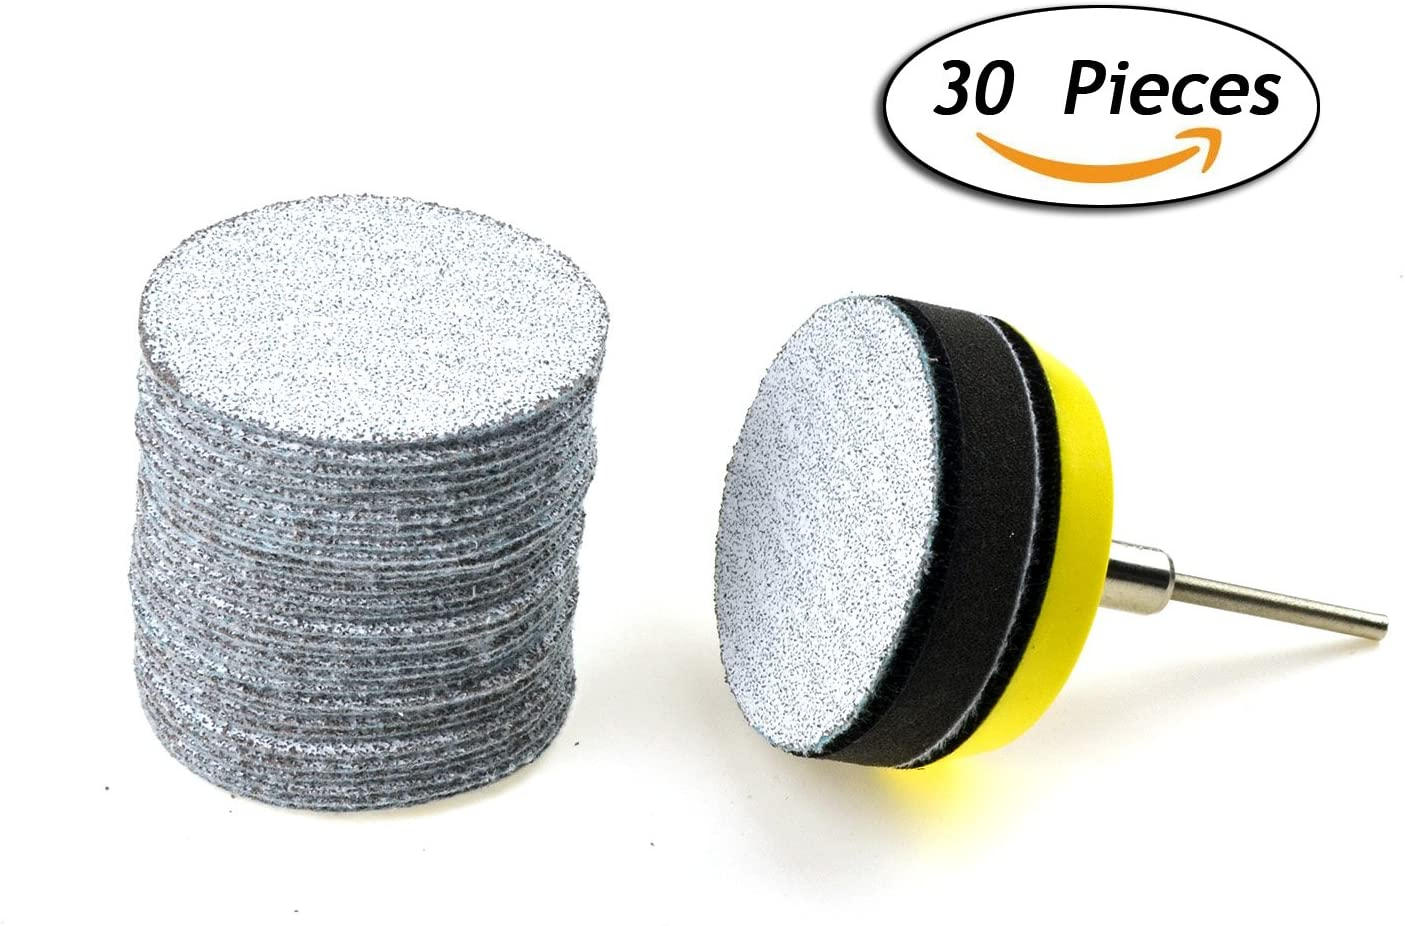 103pcs 2 Hook Loop Sanding Discs Assortment Kit 100pcs Multiple Grits Abrasive Sandpapers One 1//4 Shank Backing Pad and 2 Soft Foam Buffering Pads for Wood Metal Polishing